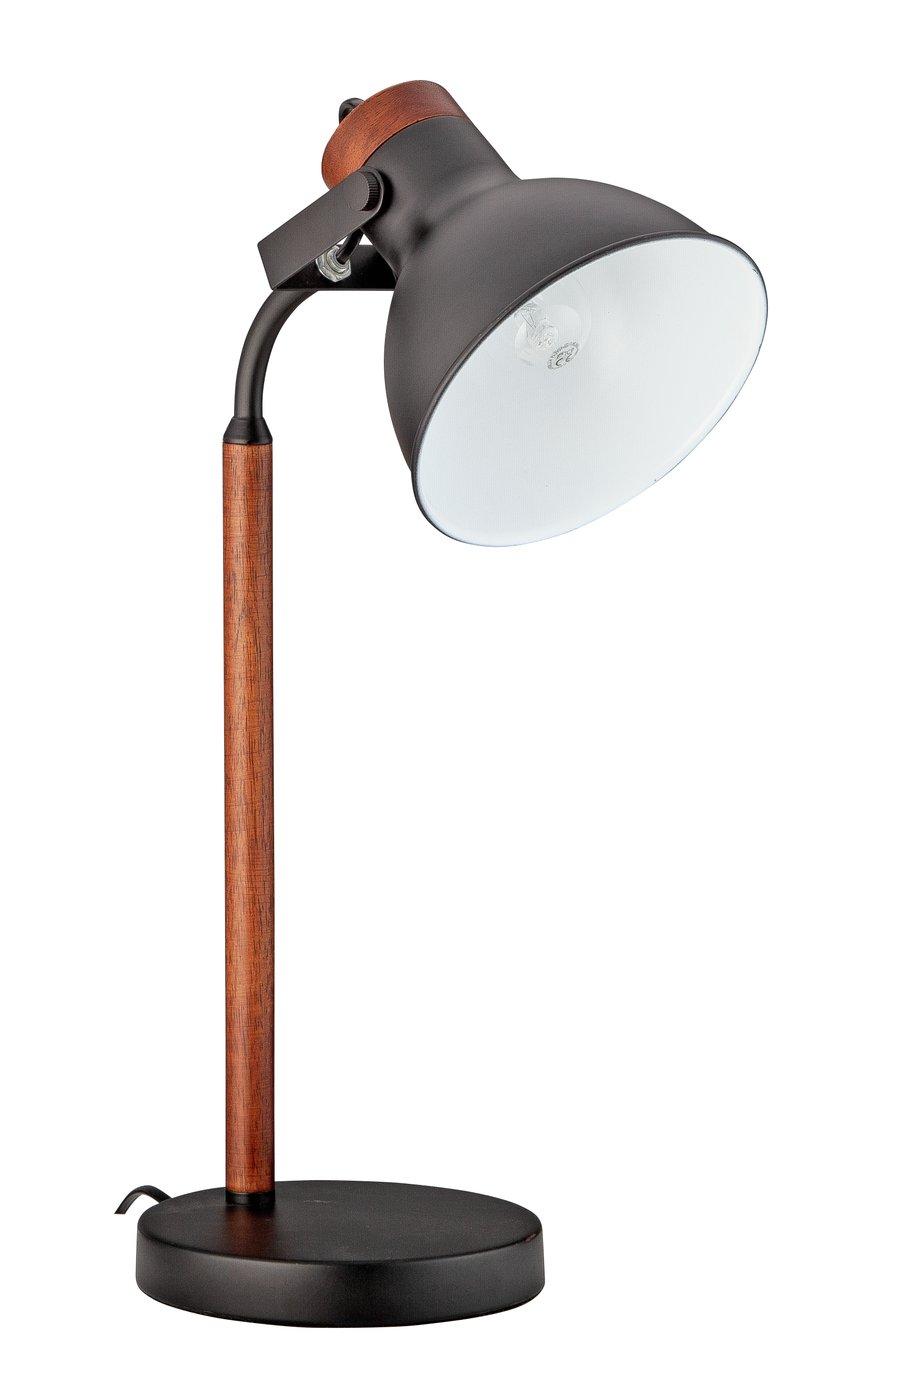 Argos Home Ruscombe Table Lamp - Dark Wood and Black